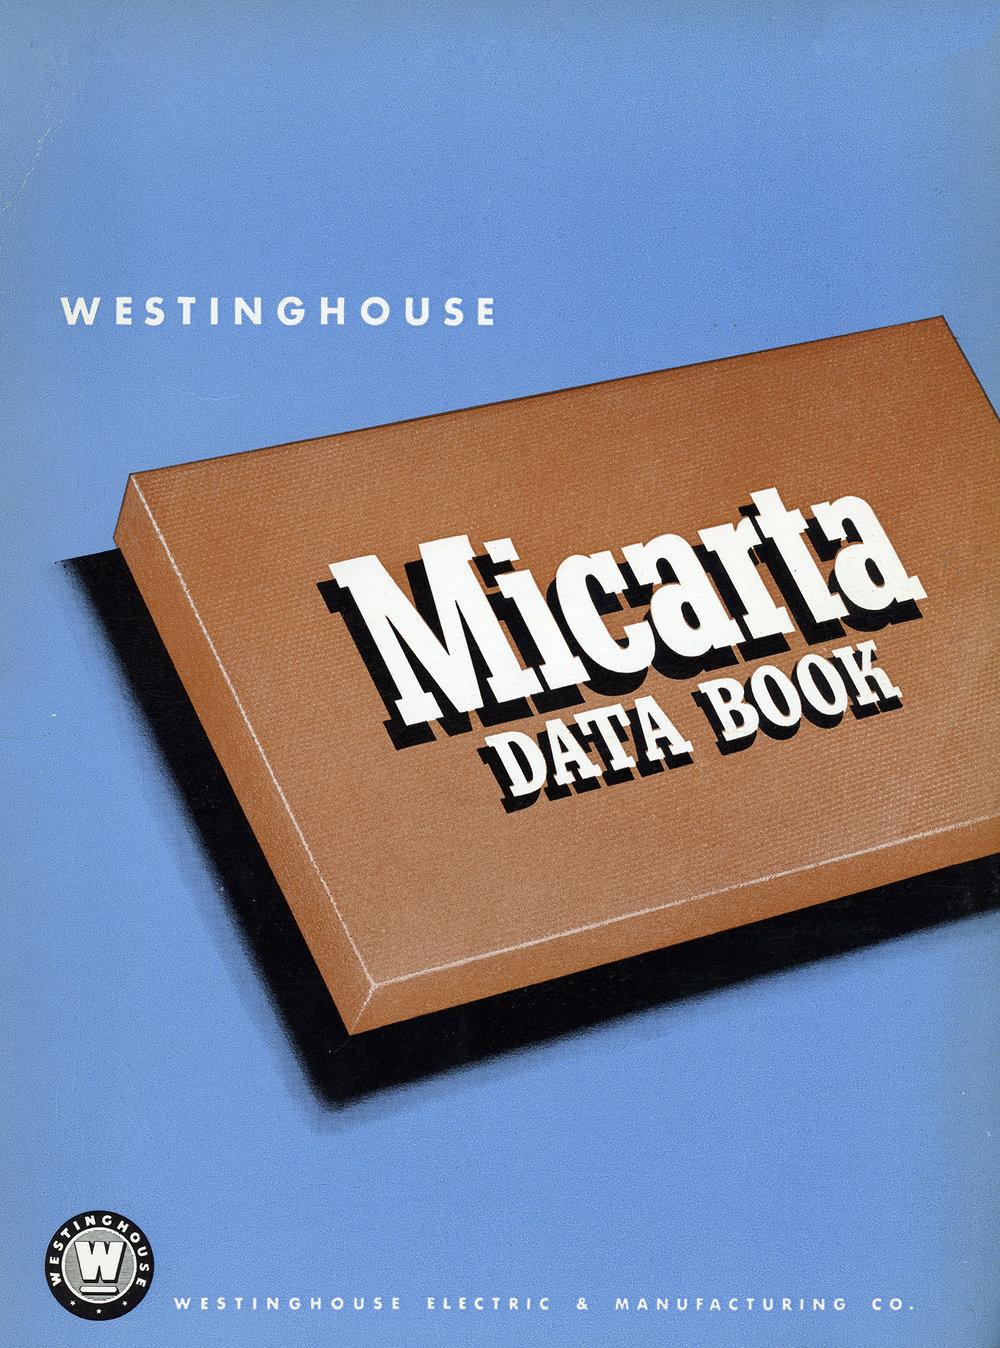 Westinghouse Micarta Data Book